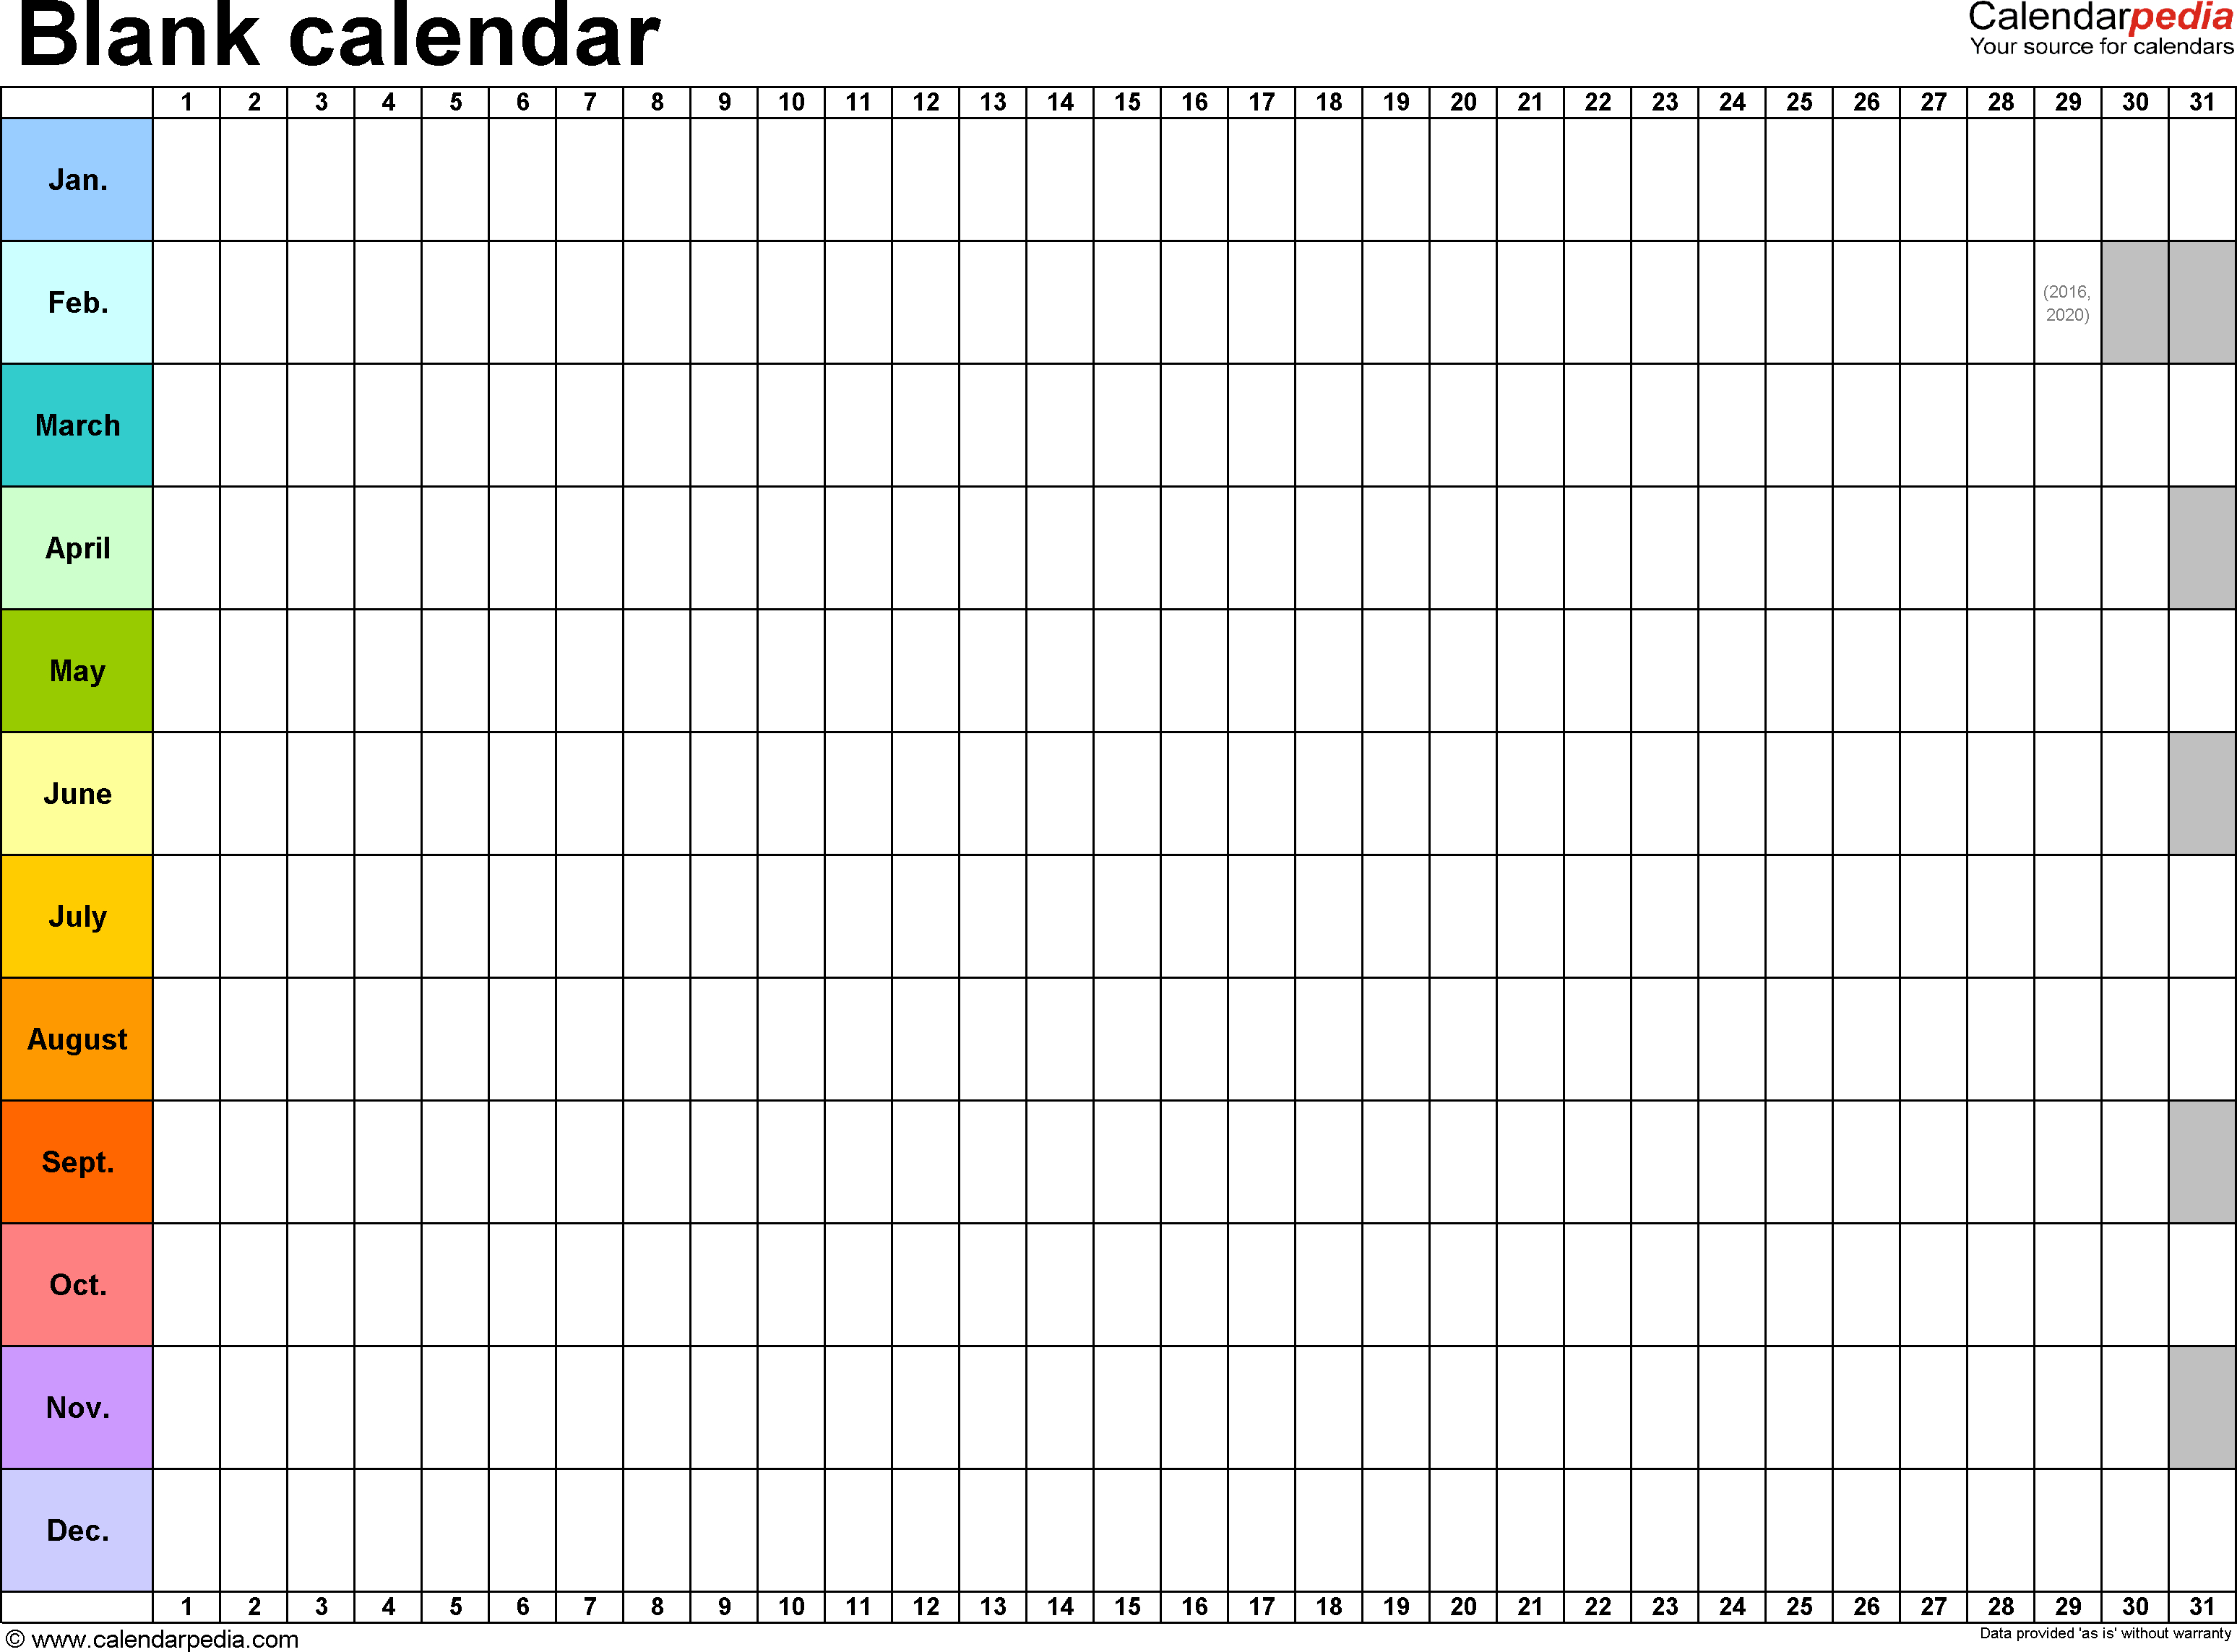 Blank Calendar - 9 Free Printable Microsoft Word Templates pertaining to Blank Printable Calendar 12 Month